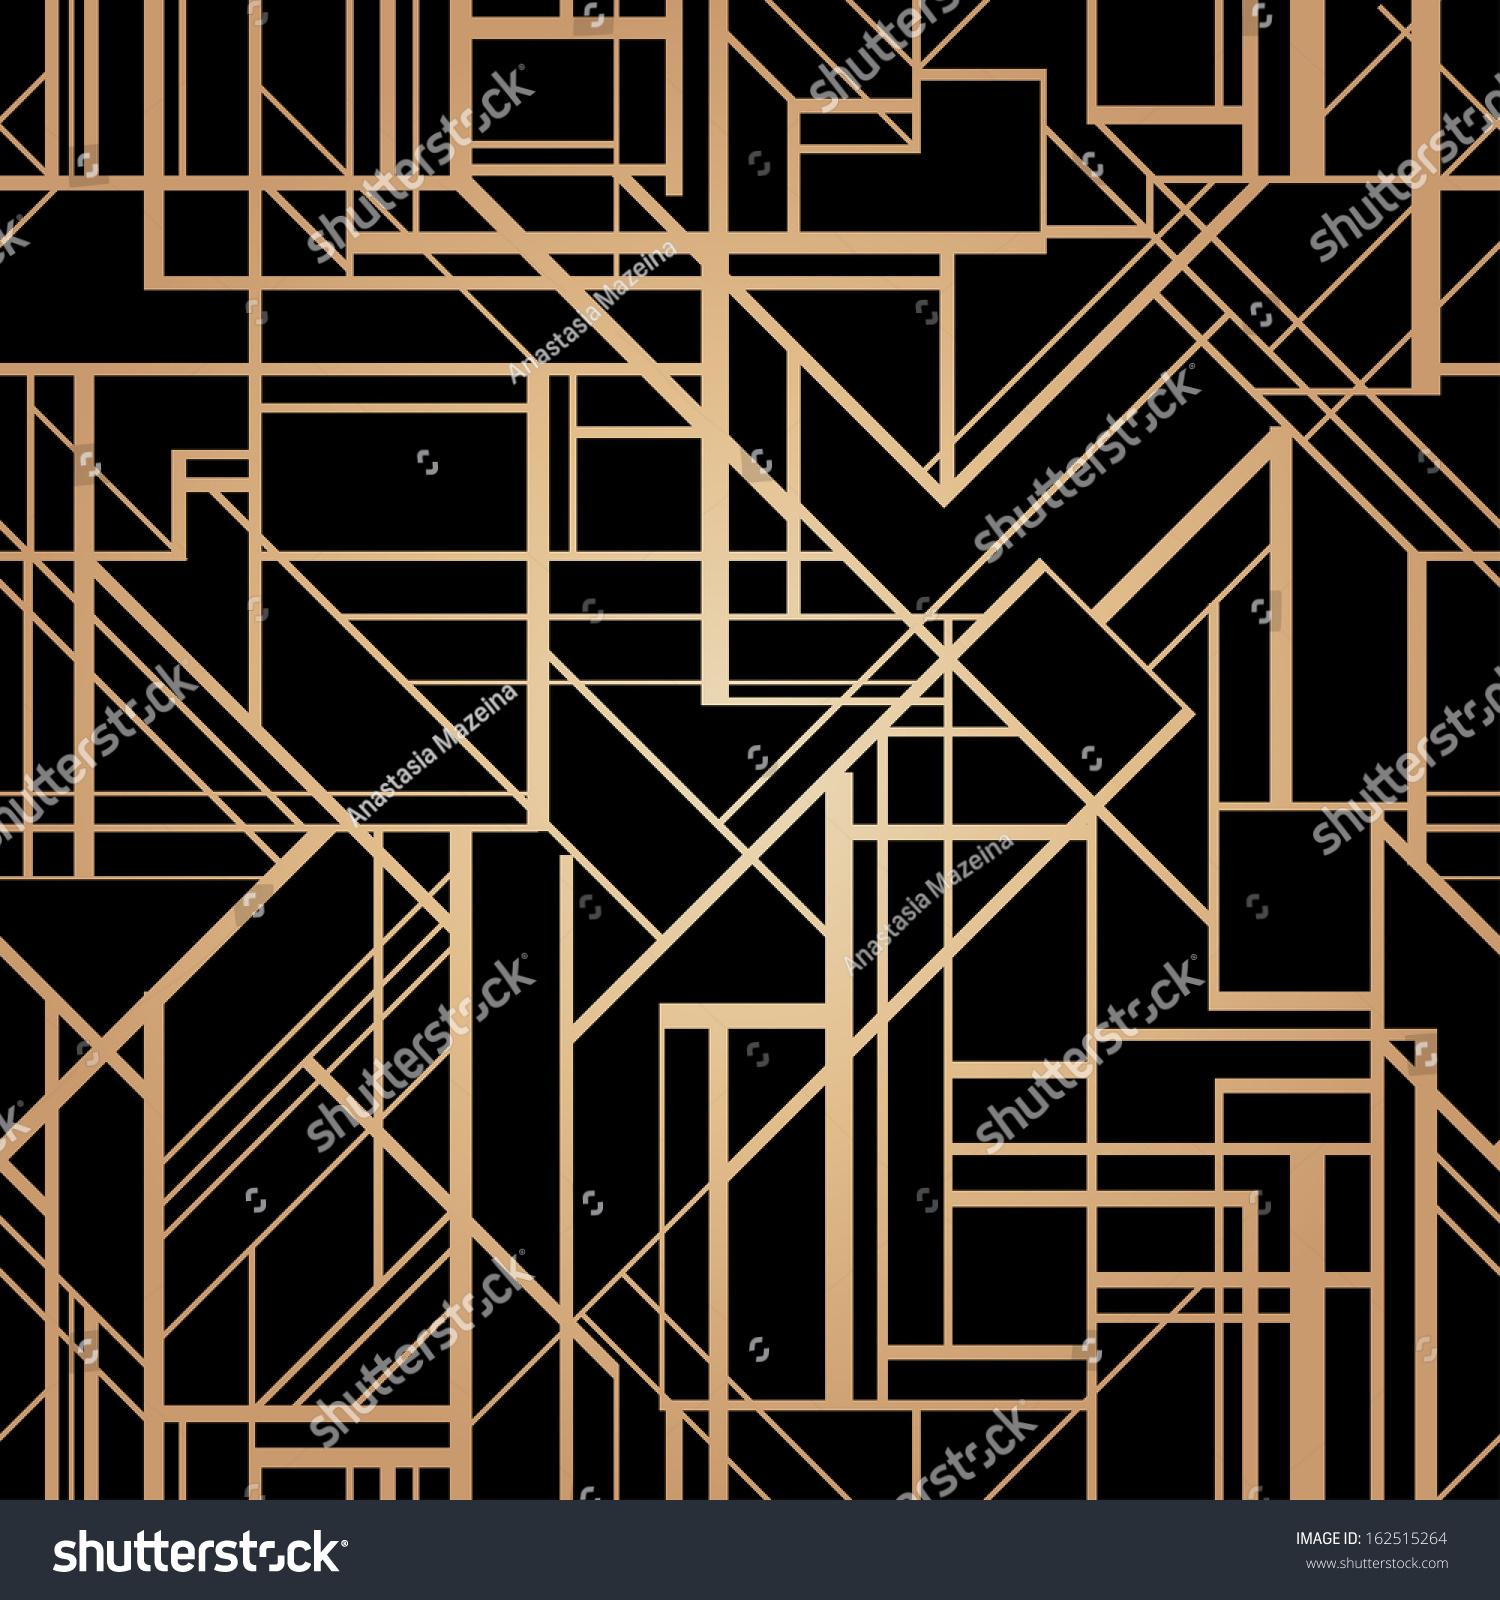 Art deco style vector geometric pattern stock vector for Art deco look